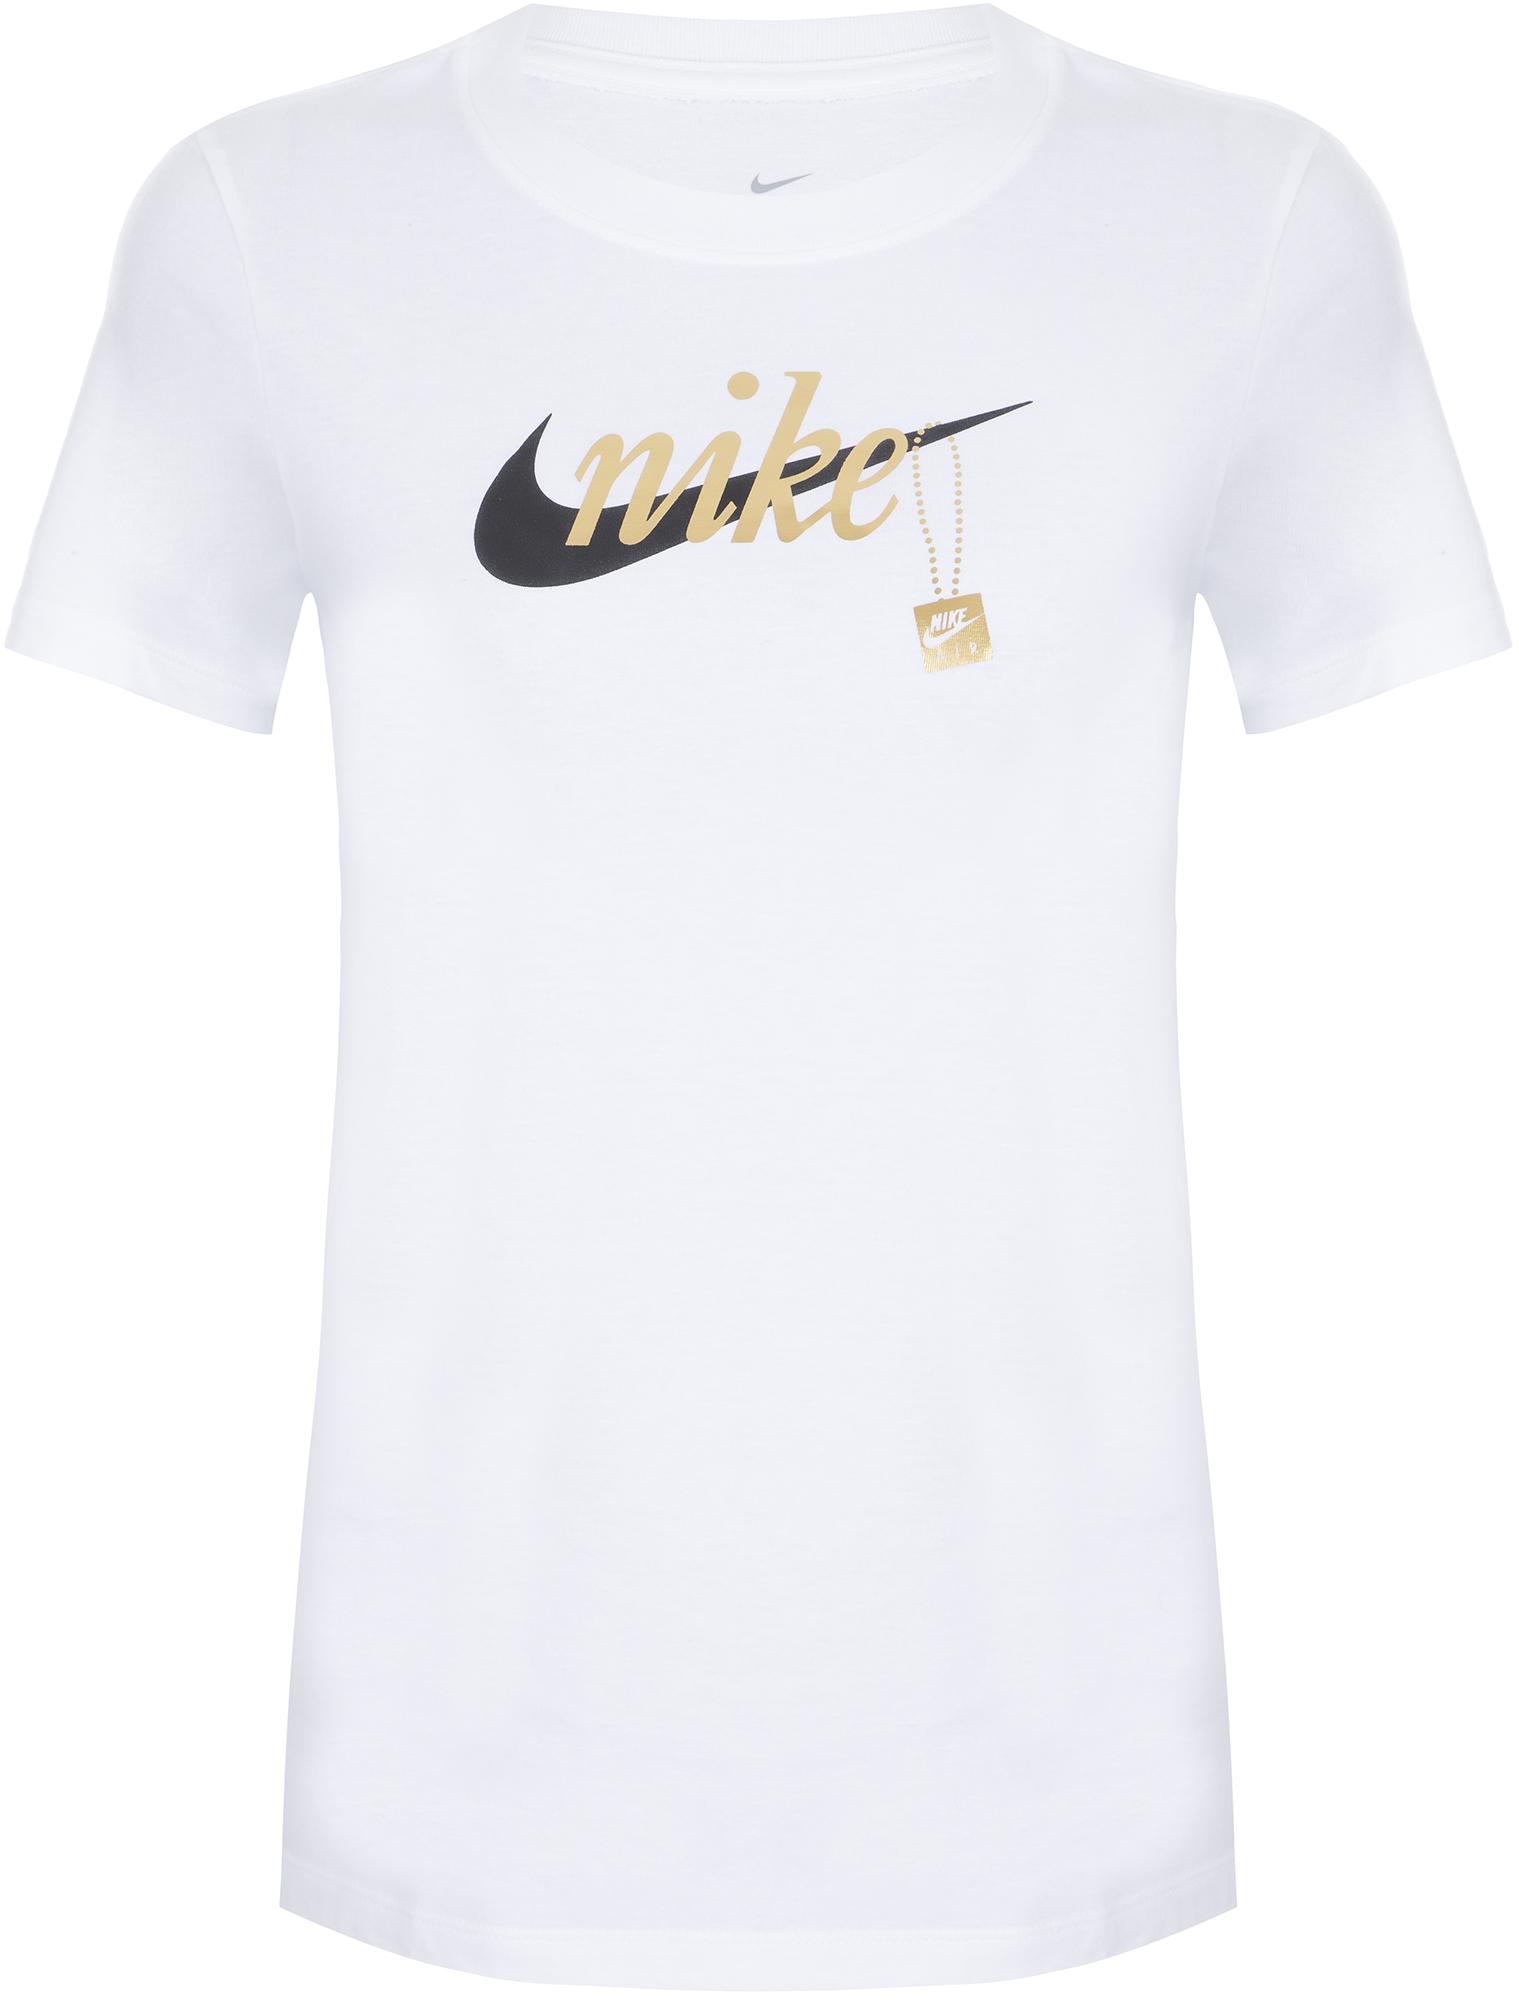 Nike Футболка женская Nike, размер 48-50 nike майка женская nike размер 48 50